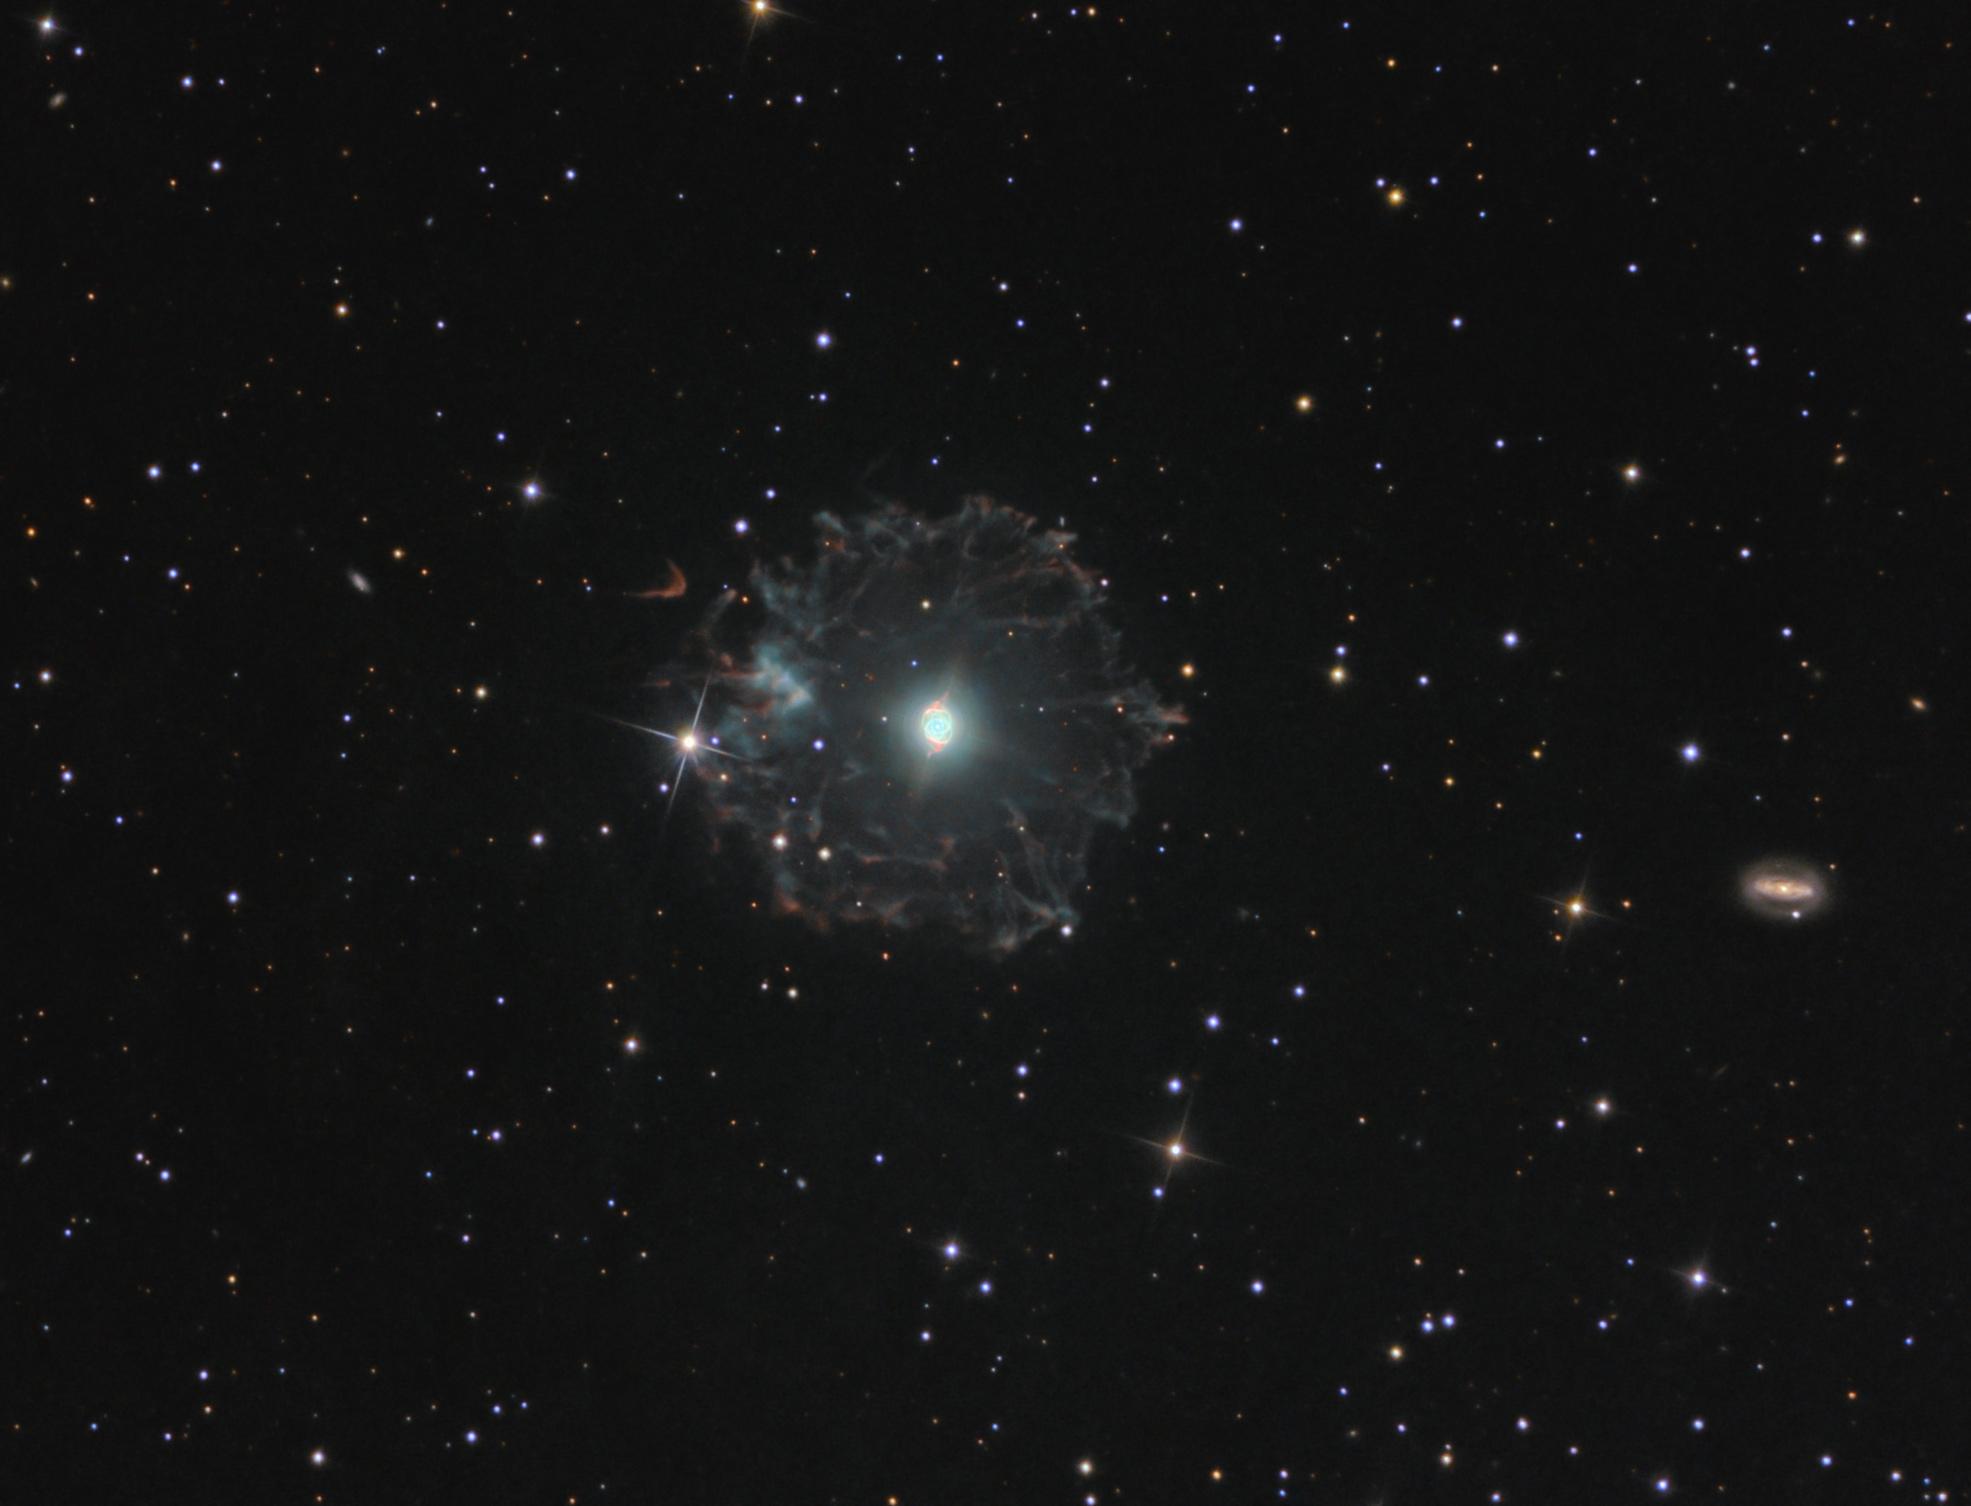 http://apod.gsfc.nasa.gov/apod/image/0706/NGC6543widedeep_schedler.jpg